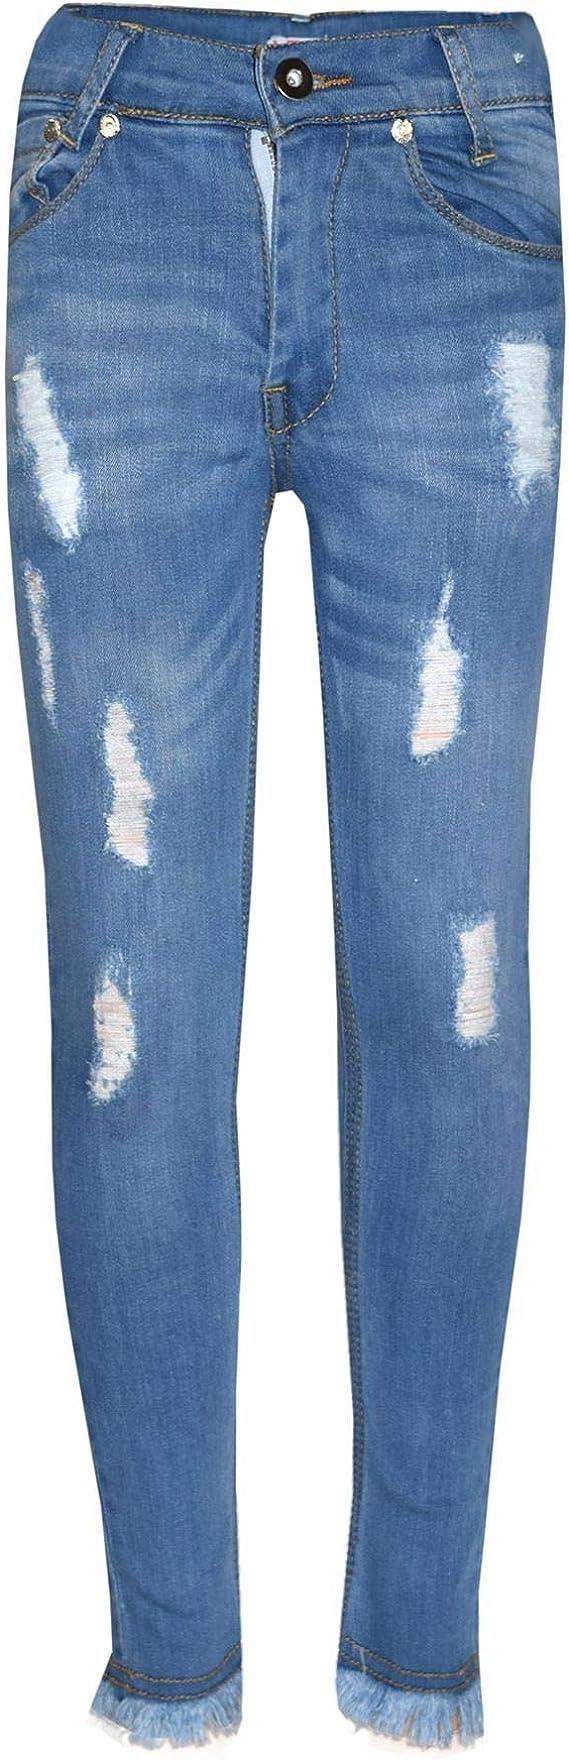 Kids Stretchy Jeans Girls Denim Jeggings Pants Trousers Leggings Age 5-13 Years